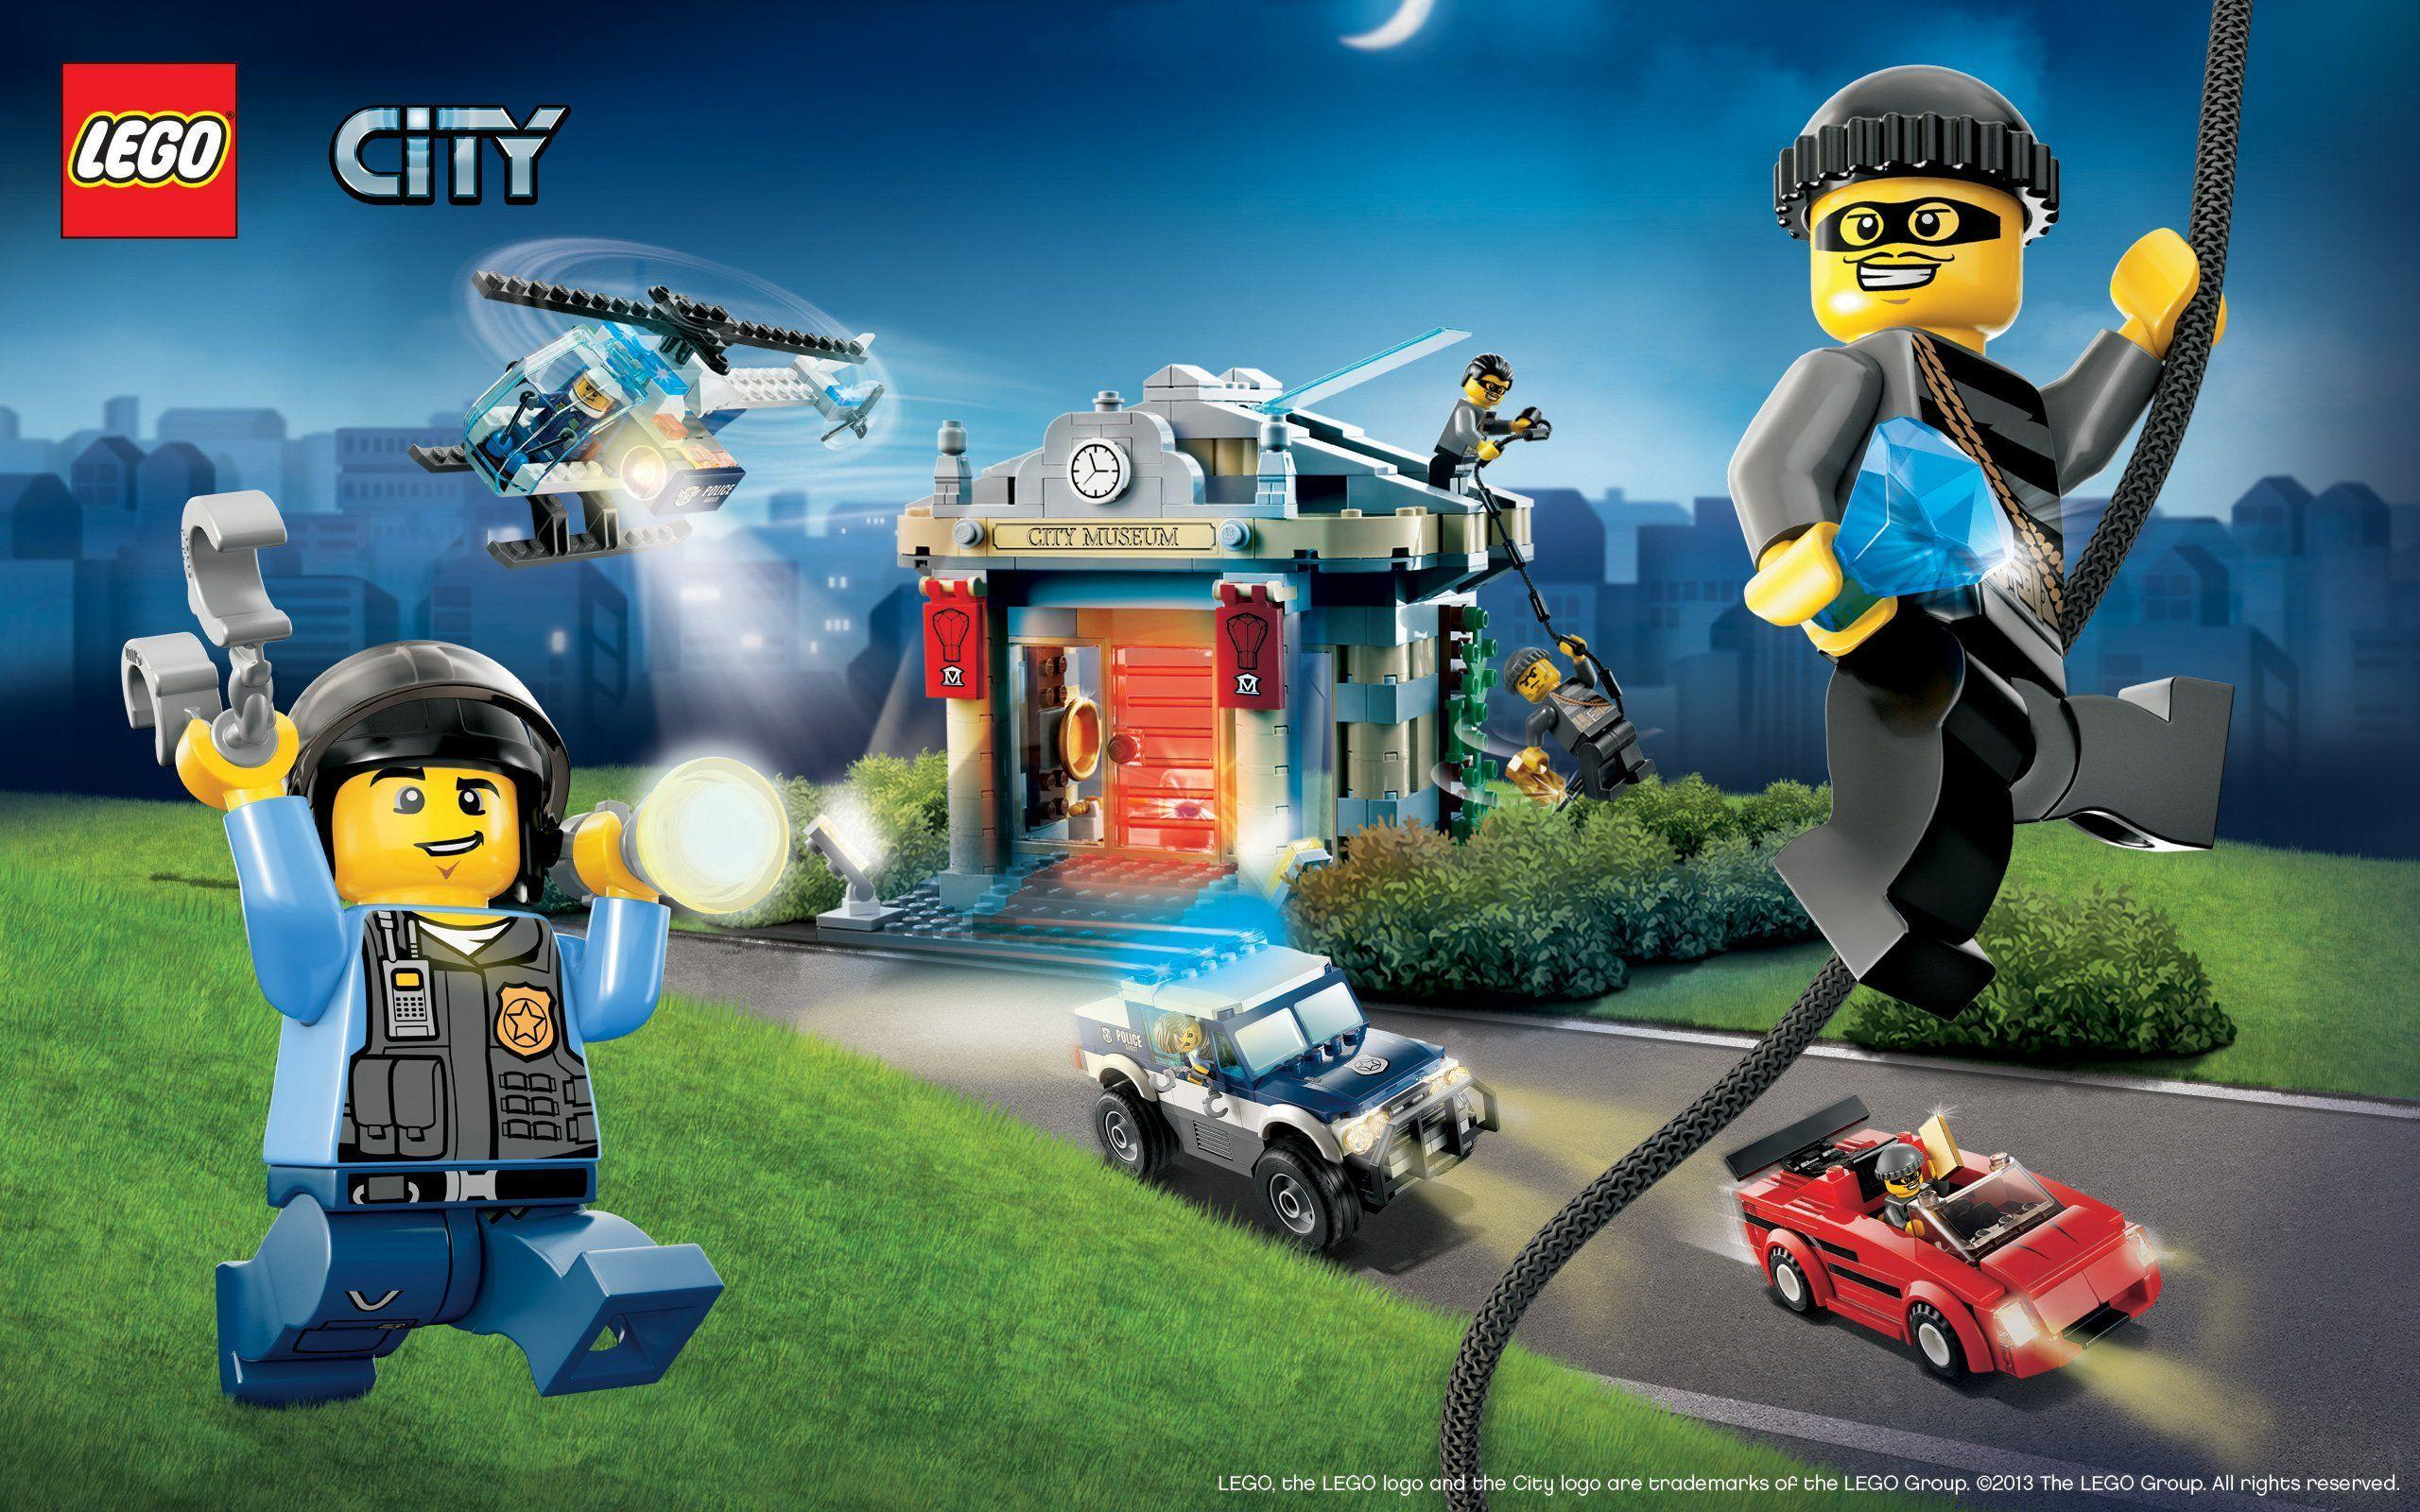 Lego City Wallpapers - Wallpaper Cave